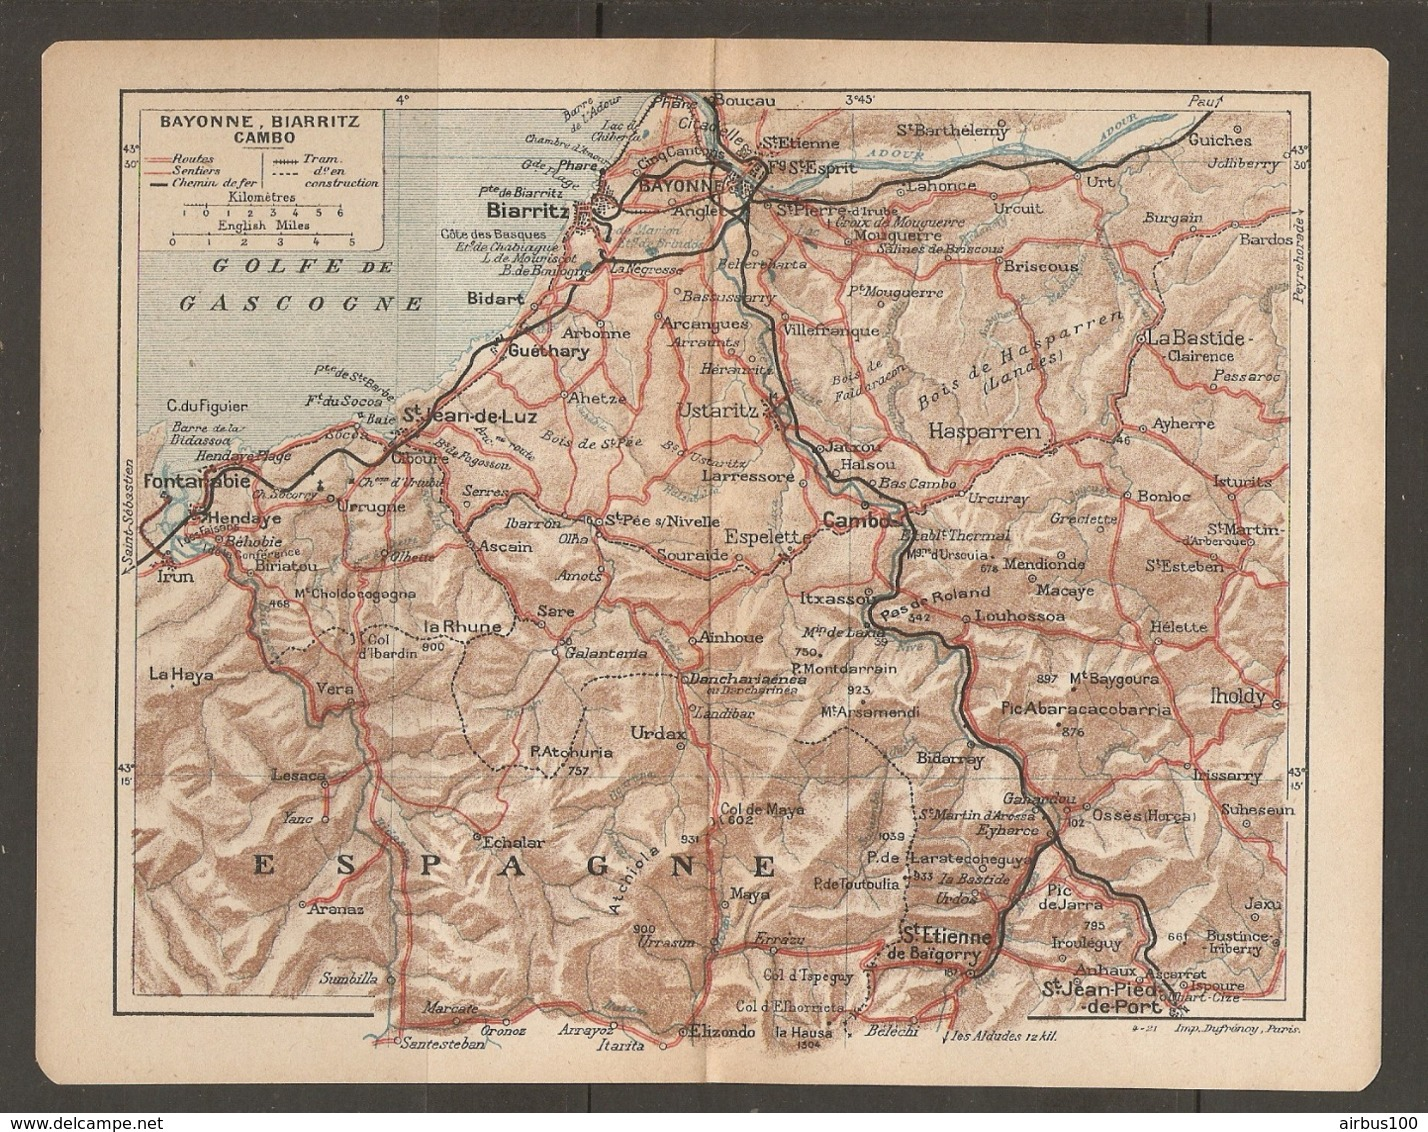 CARTE PLAN 1921 - BAYONNE BIARRITZ CAMBO - ESPAGNE SPAIN - IHOLDY IRUN FONTARABIE URDAX La BASTIDE - Topographical Maps